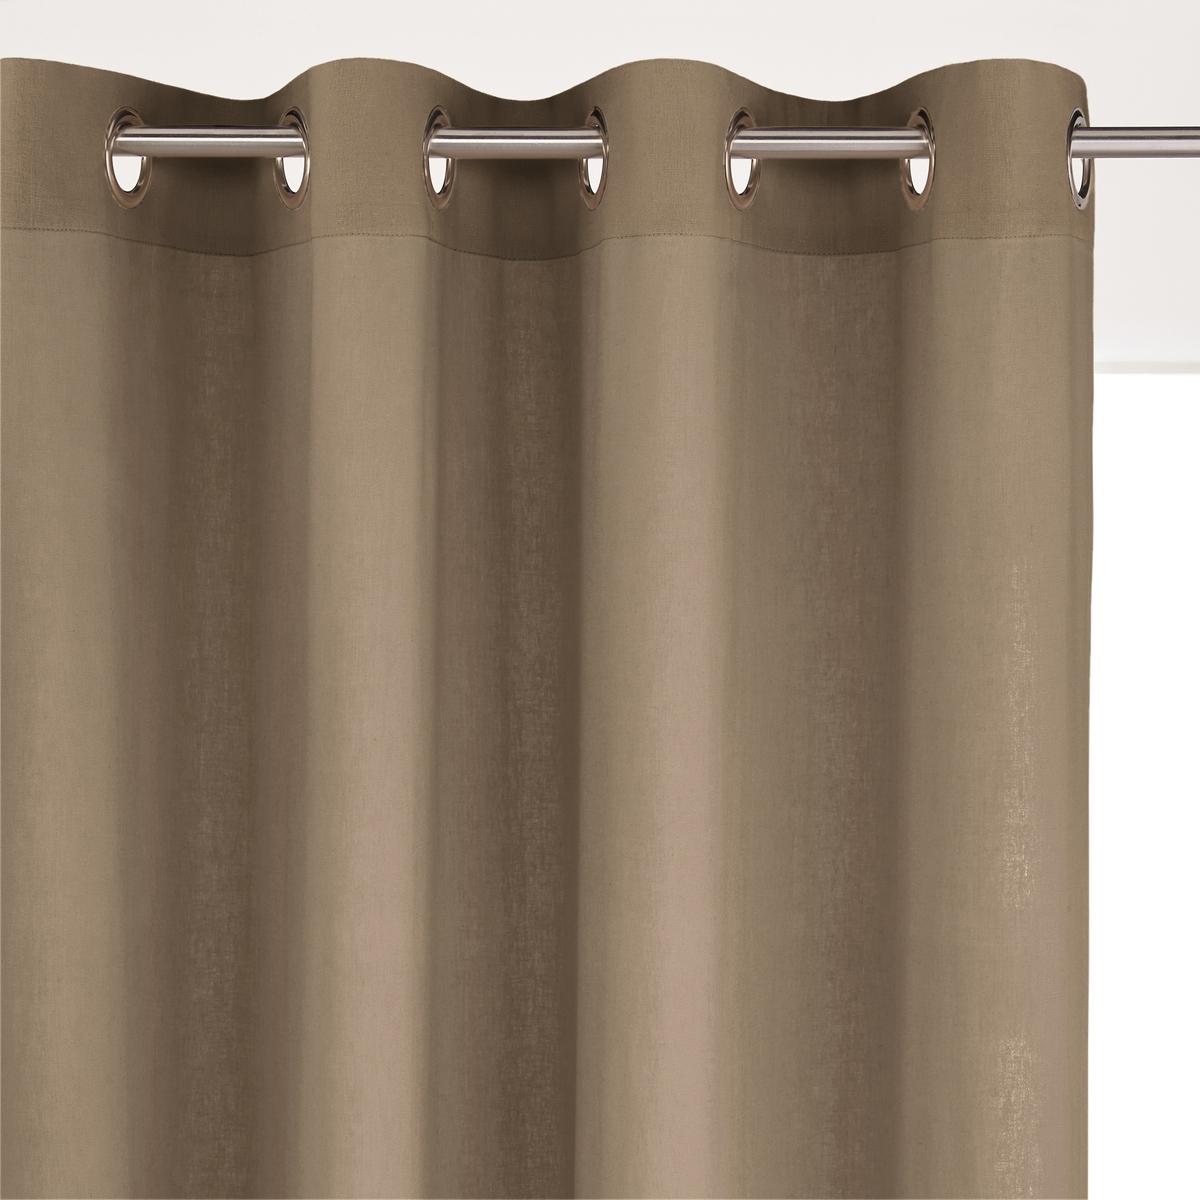 Штора La Redoute Из льна и вискозы с люверсами ODORIE 350 x 135 см каштановый брюки широкие 7 8 из льна и вискозы